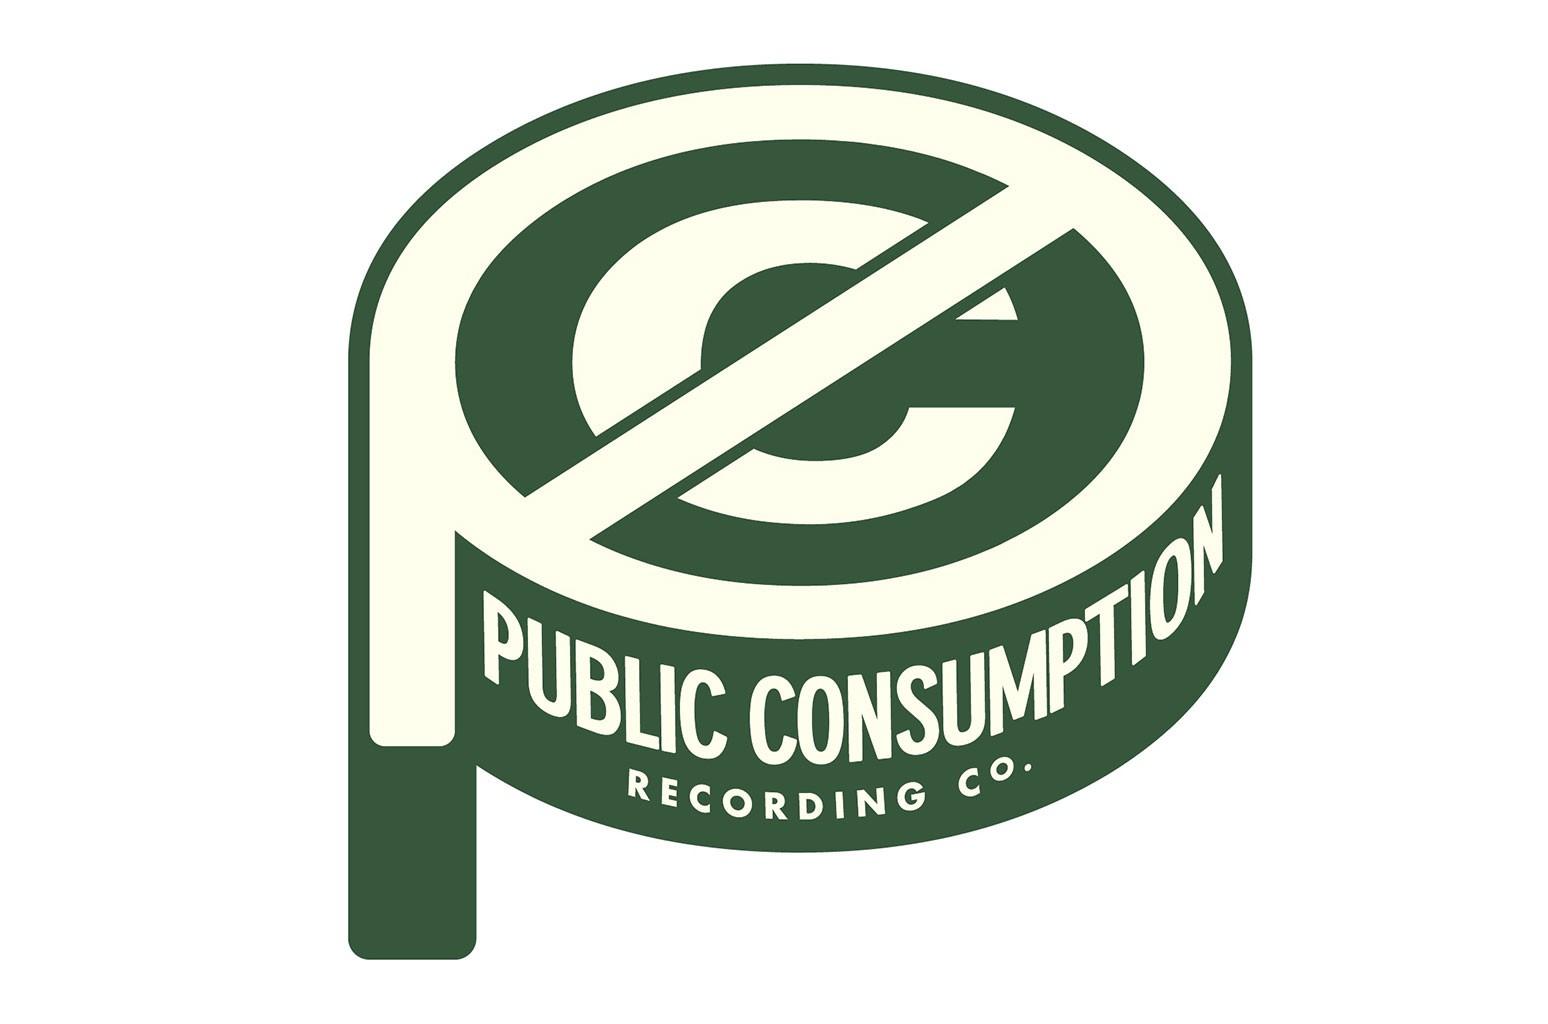 Public Consumption Recording Co.